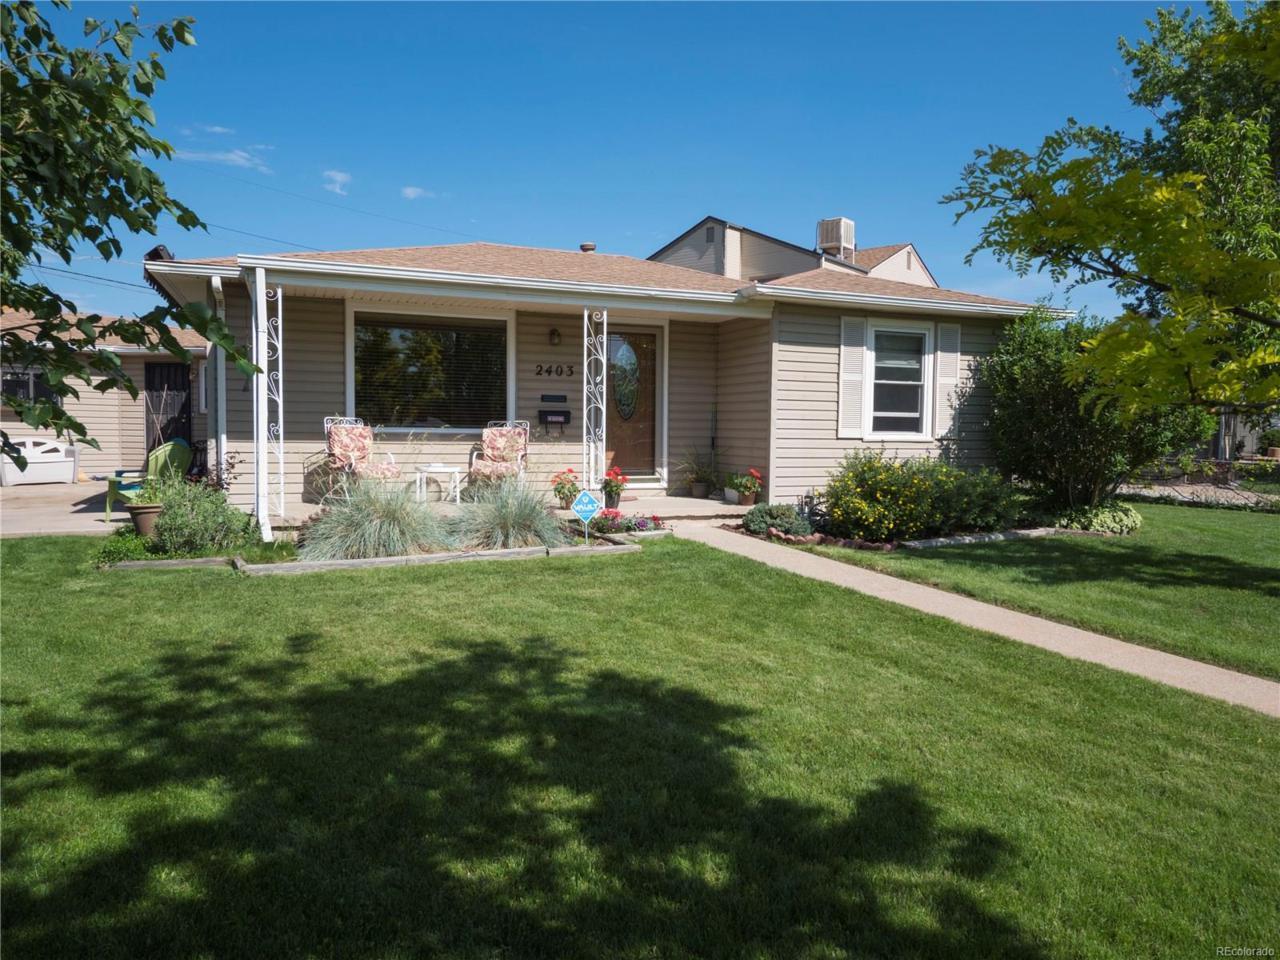 2403 Newland Street, Edgewater, CO 80214 (MLS #4333804) :: 8z Real Estate